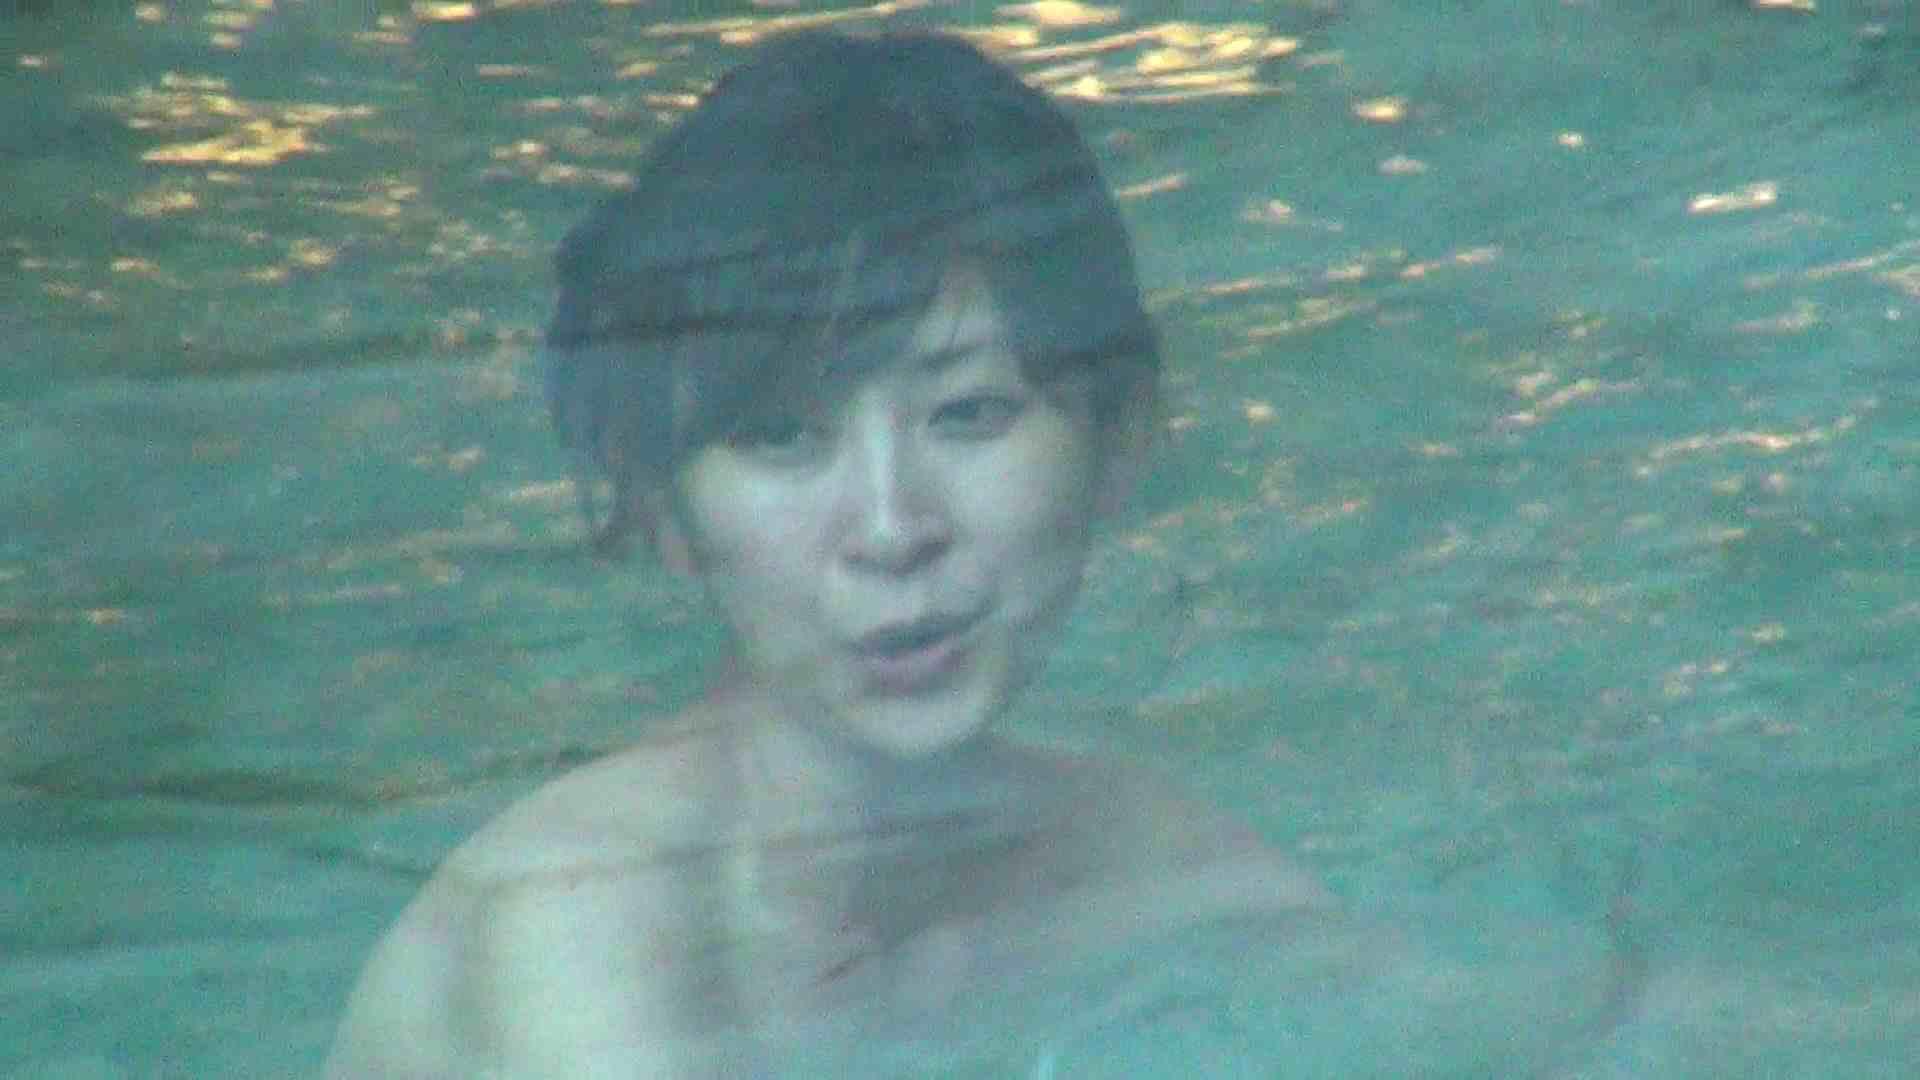 Aquaな露天風呂Vol.294 OLセックス | 盗撮  75画像 55